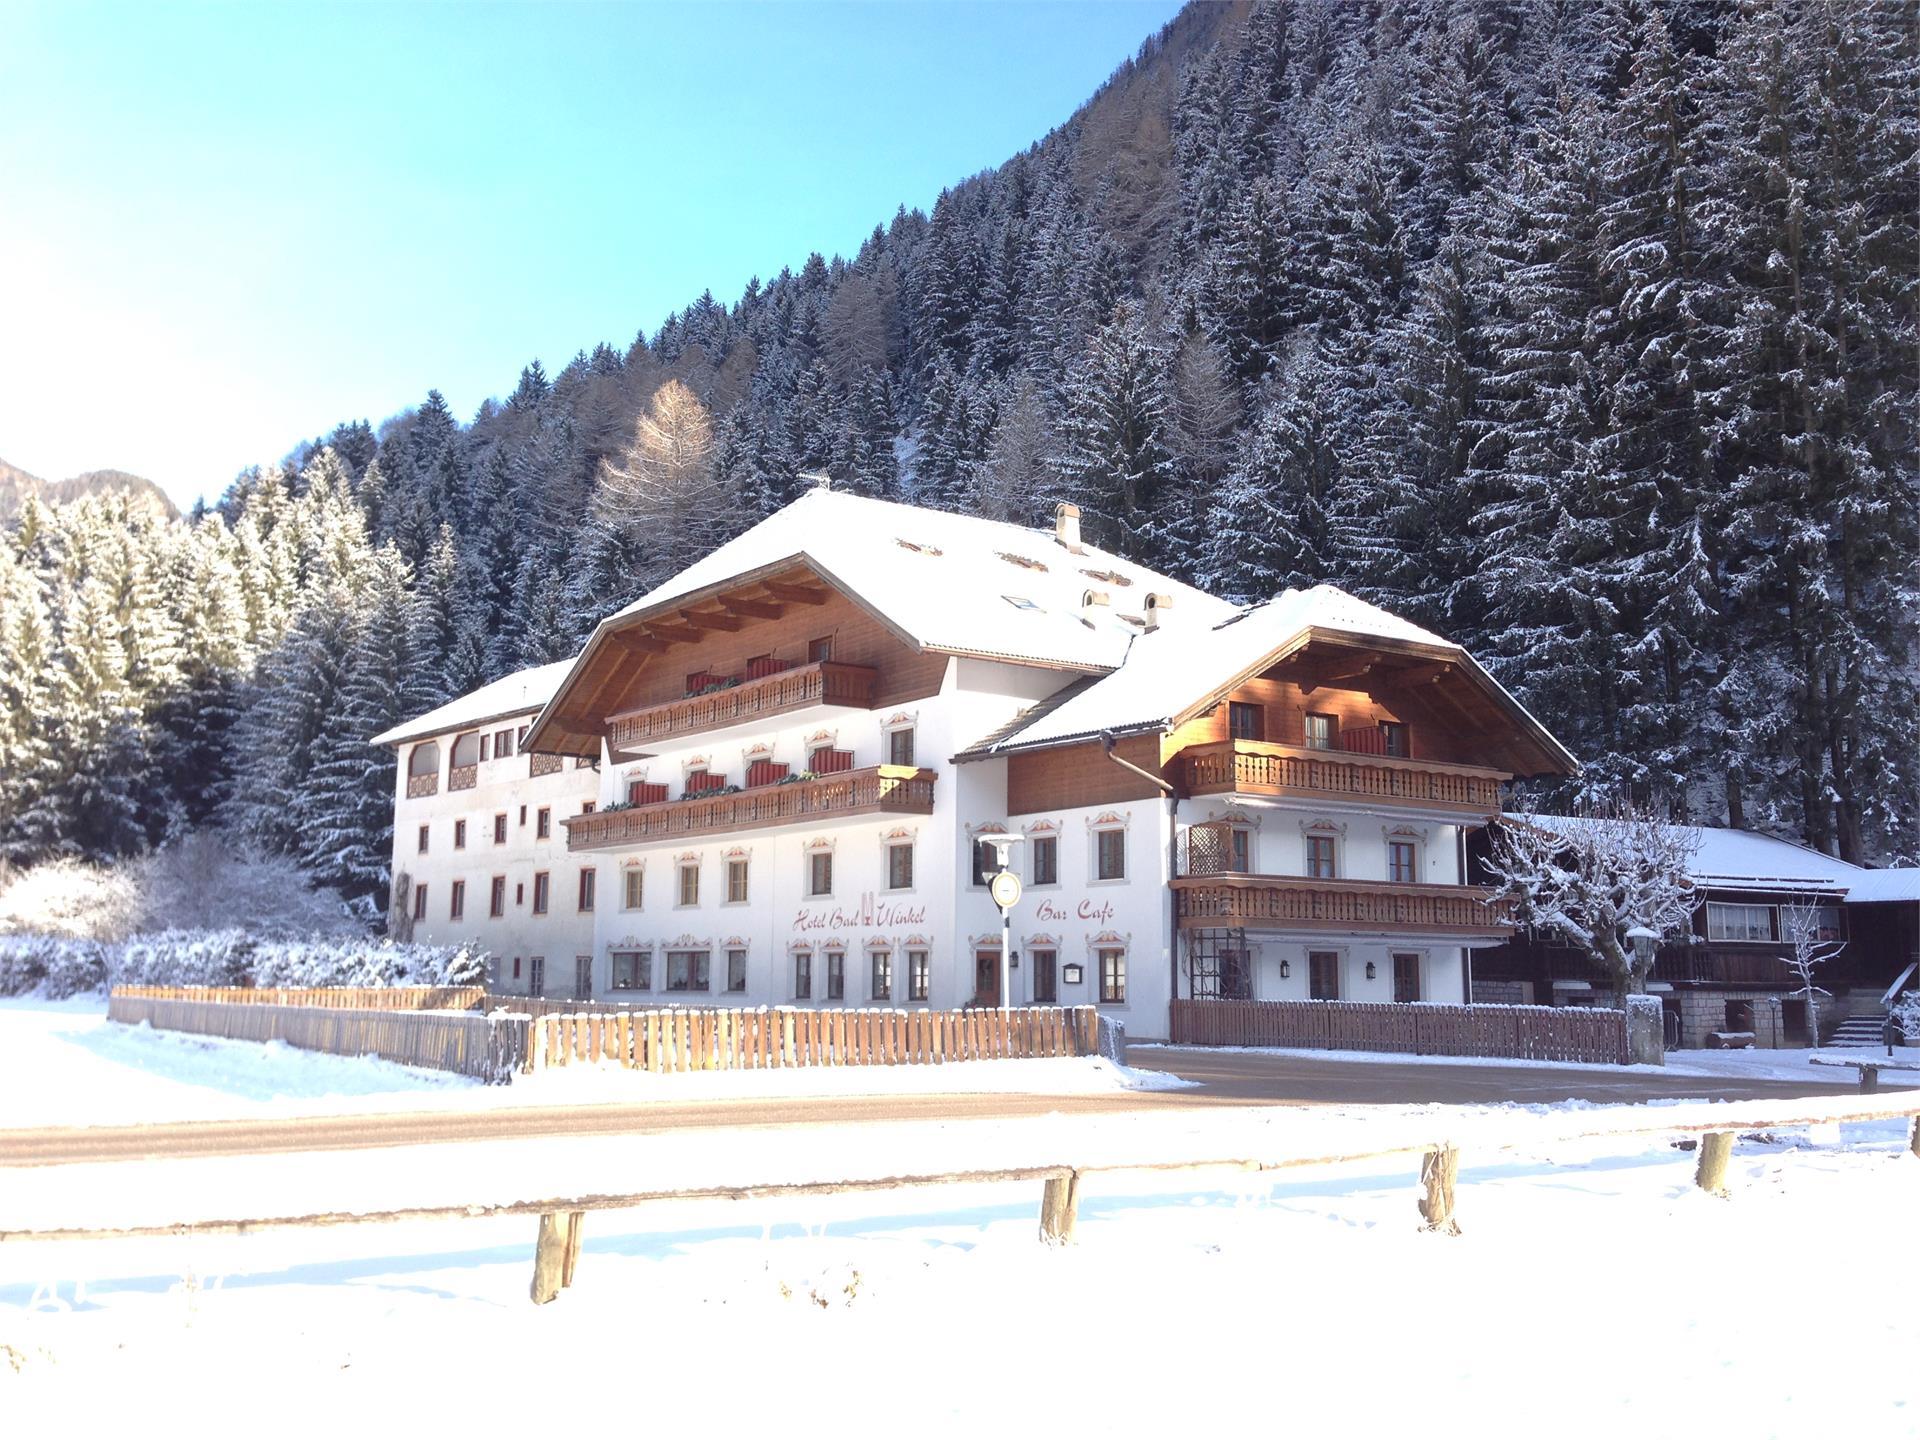 Vista albergo inverno